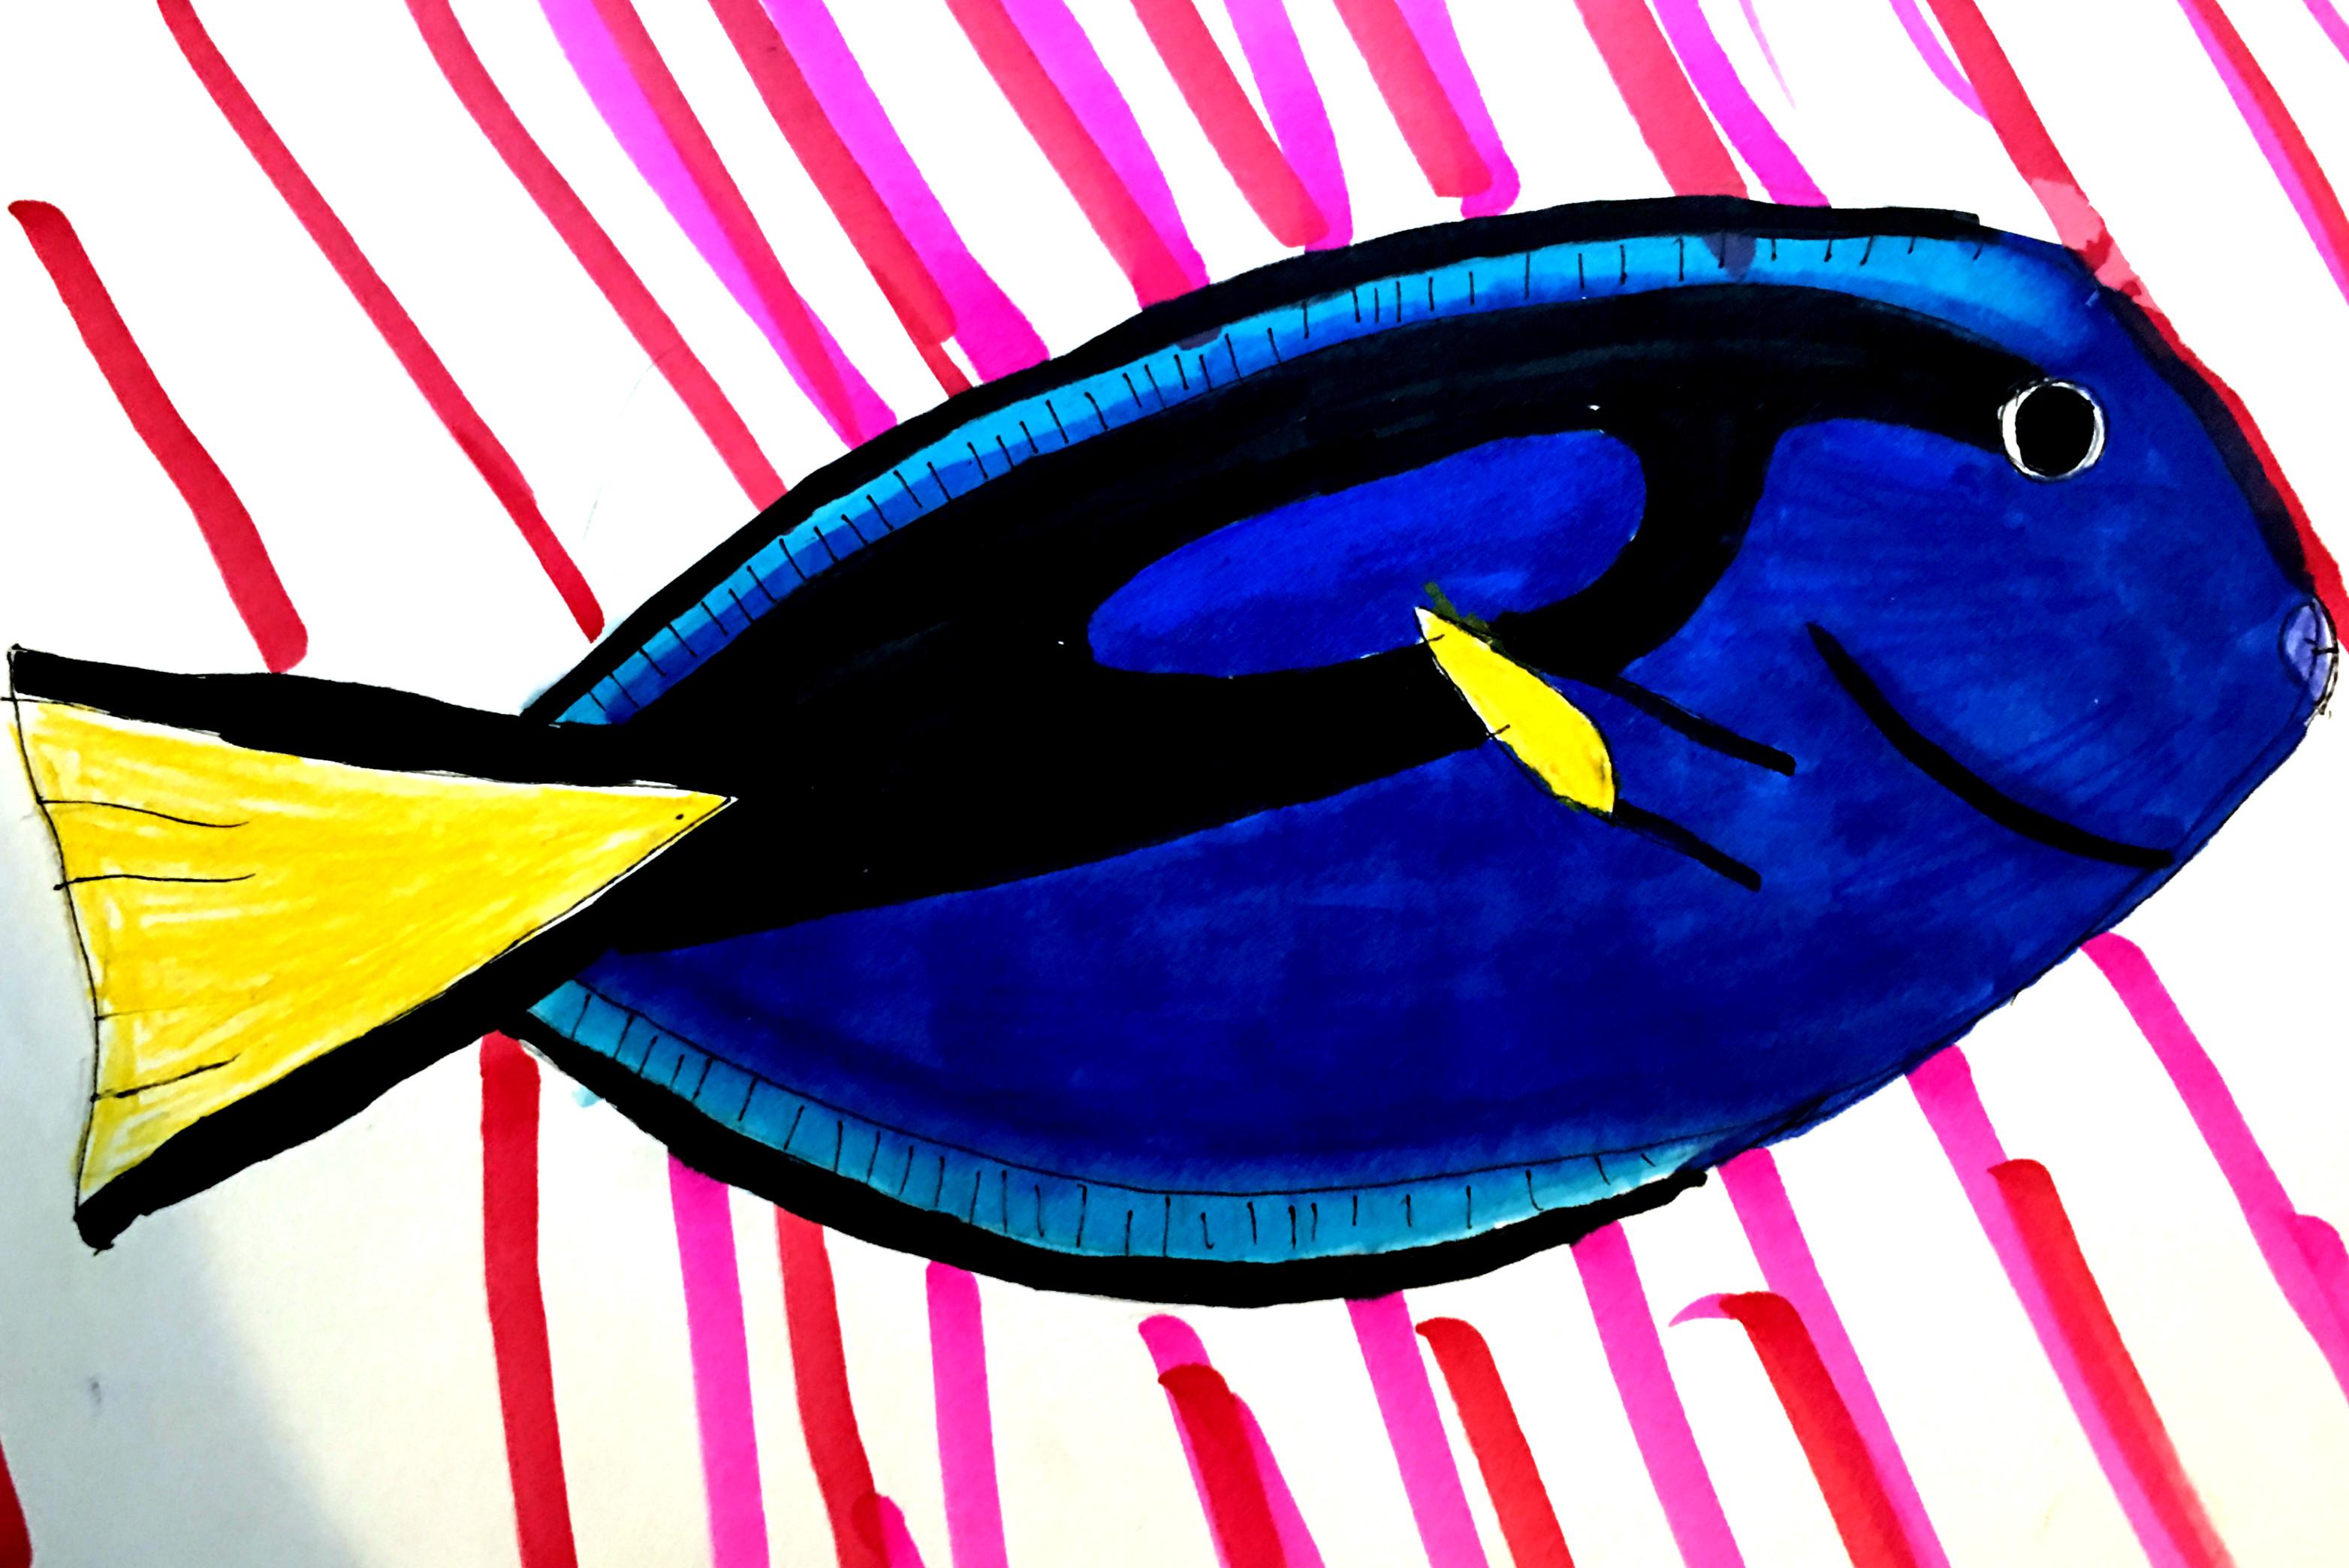 Blue Tang (Dory)